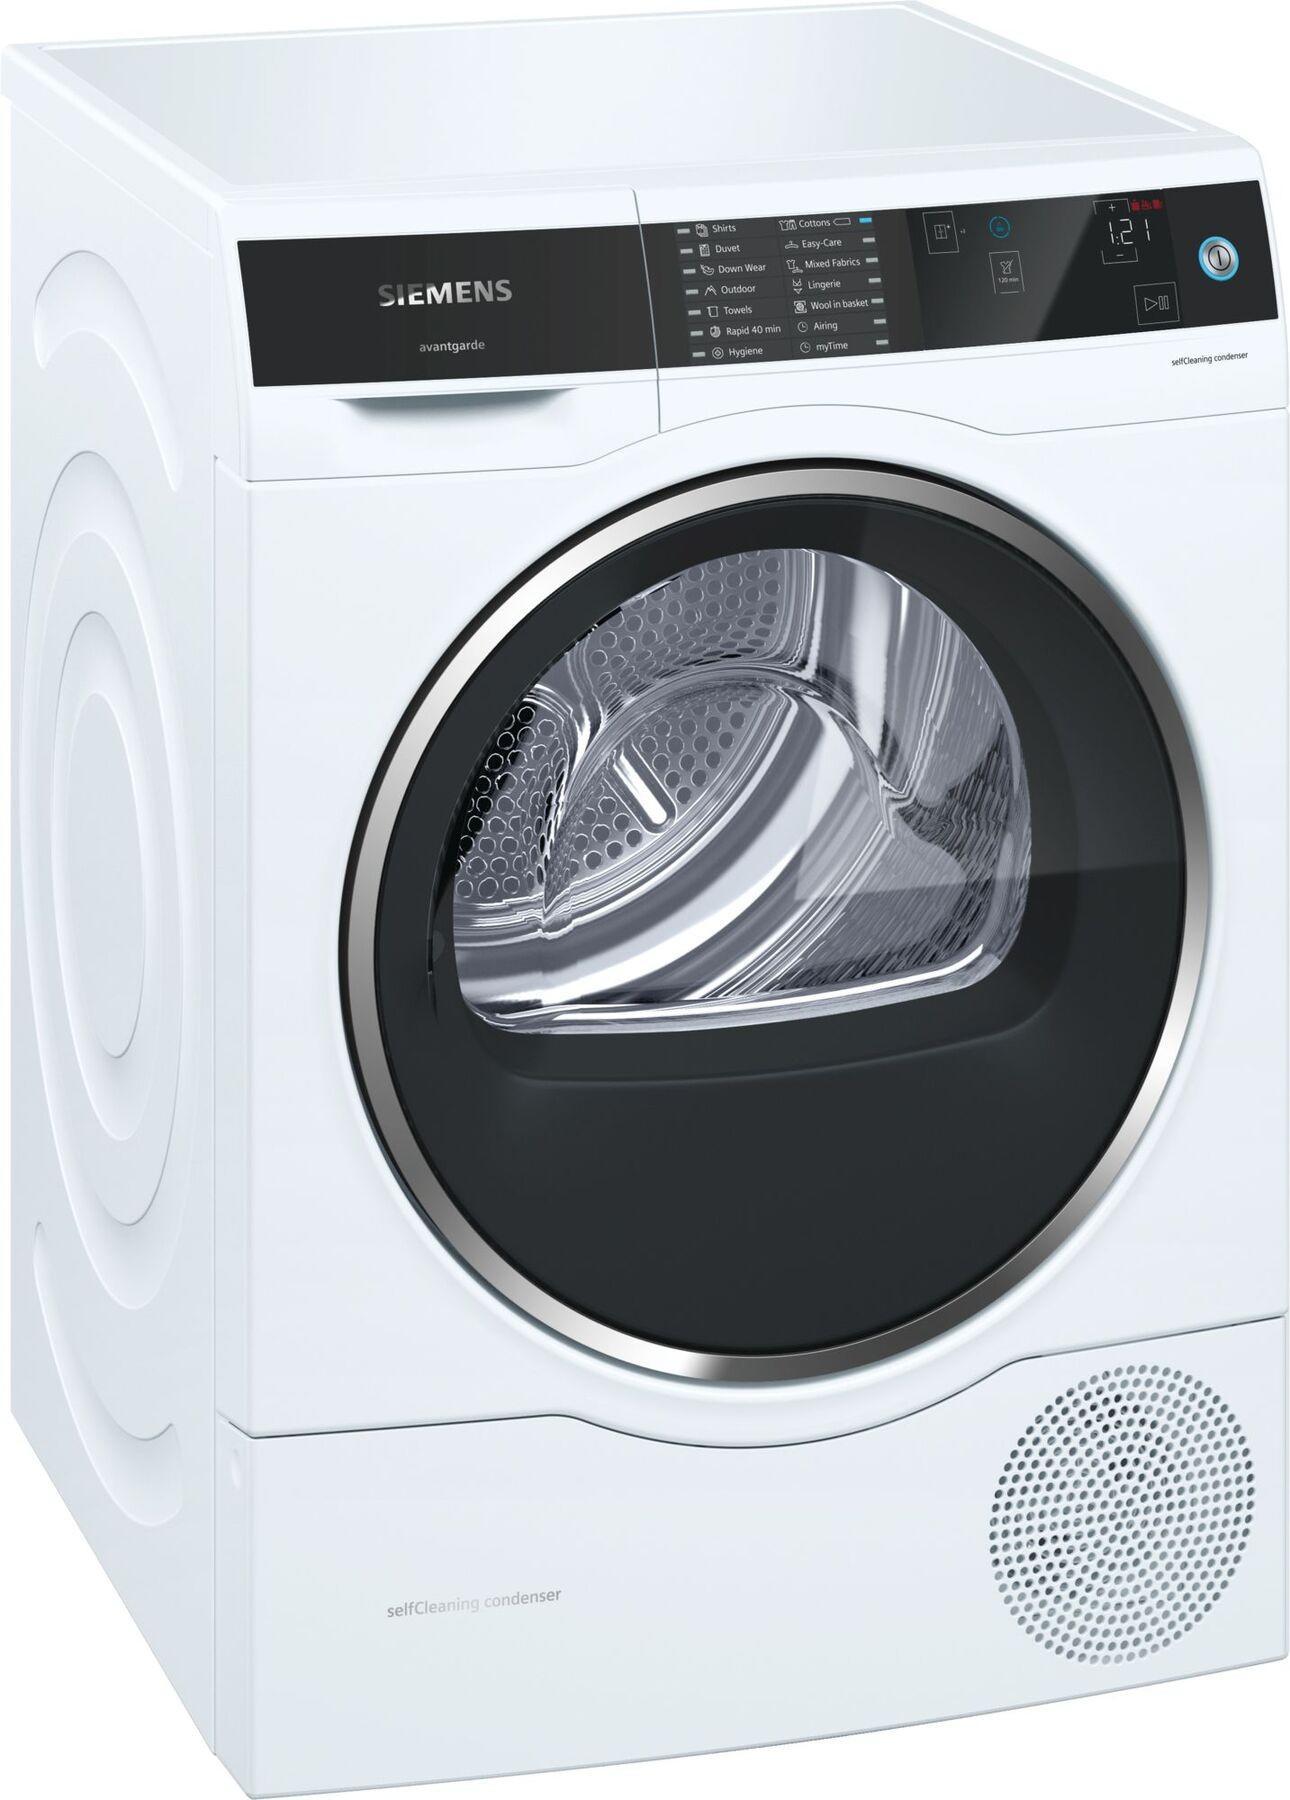 Image of Avantgarde WT7UH640GB 8Kg Self Cleaning Heat Pump Condenser Tumble Dryer